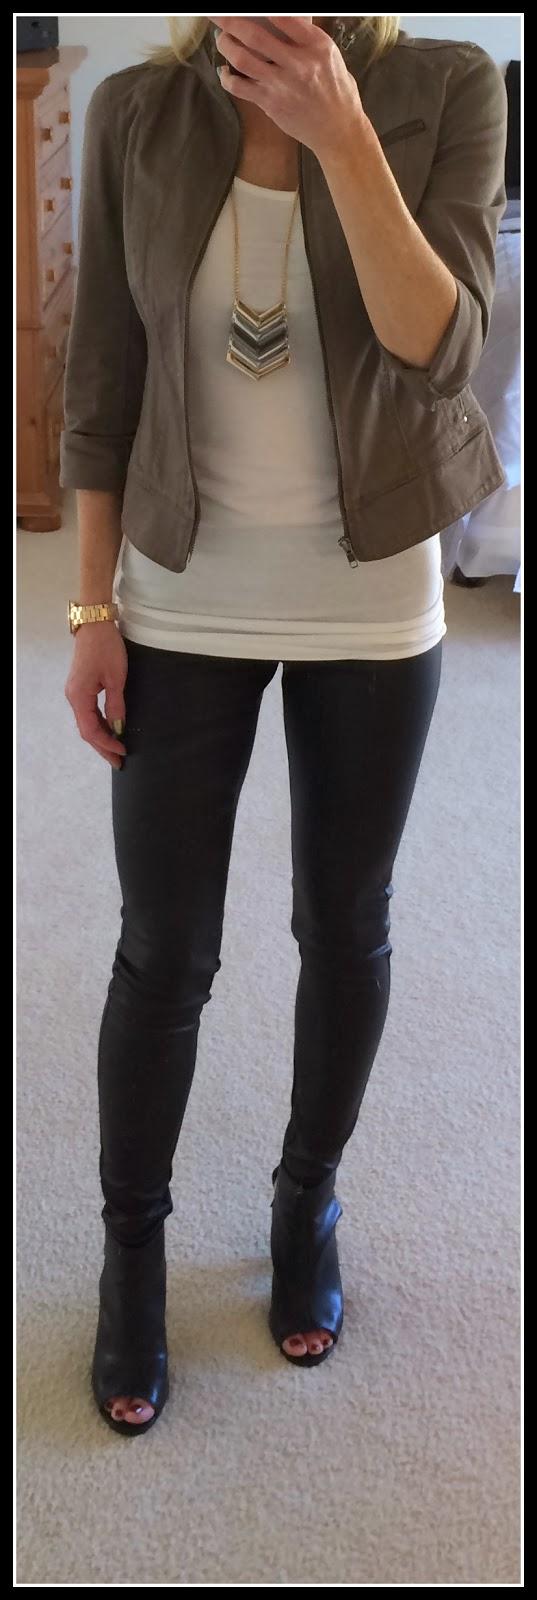 Express chevron necklace, twill roll sleeve moto jacket, scuba leggings, runway bootie, peep toe bootie